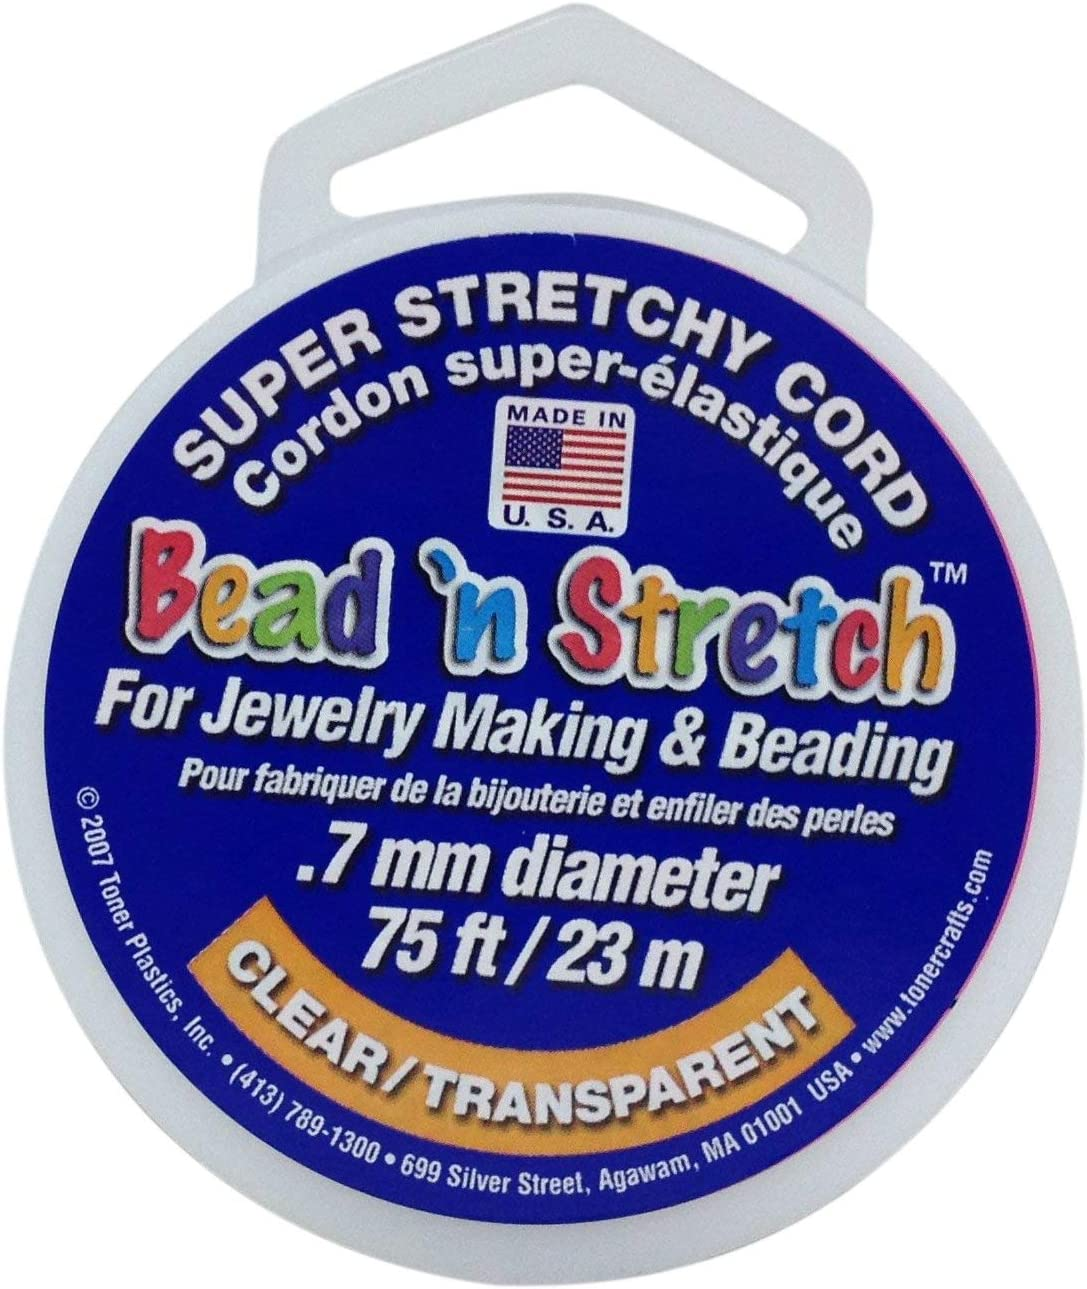 Clear Bead N Stretch 5.5 x 3 x 1.75 inches